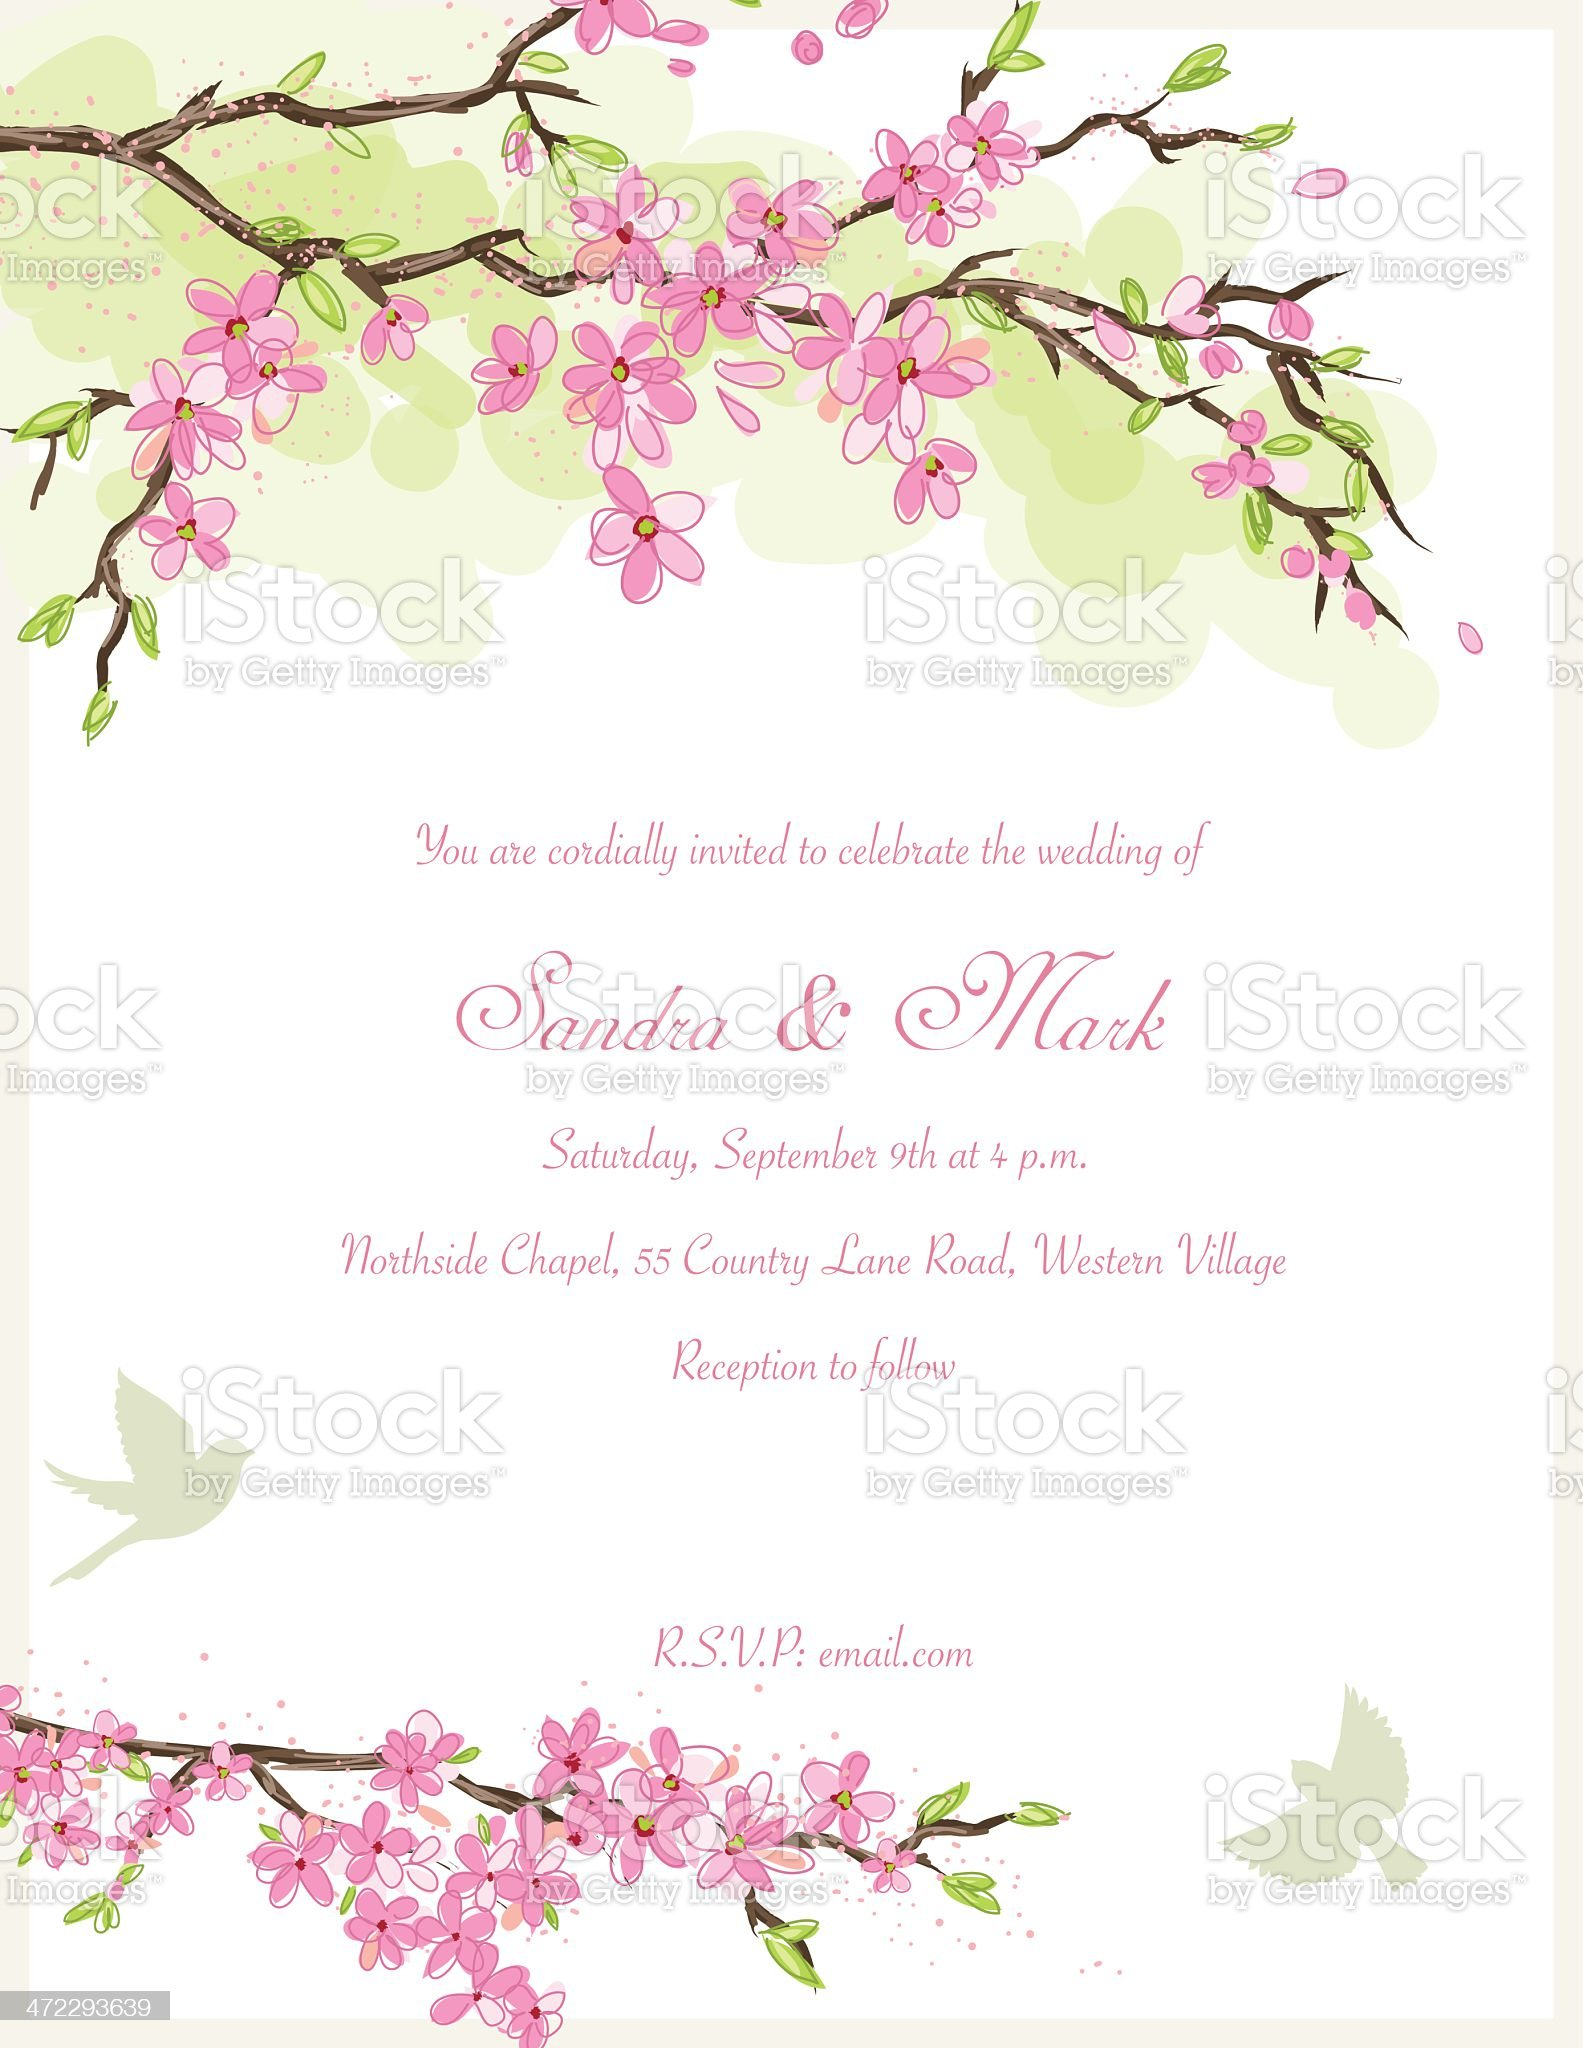 Cherry Blossom Wedding Invitation royalty-free stock vector art